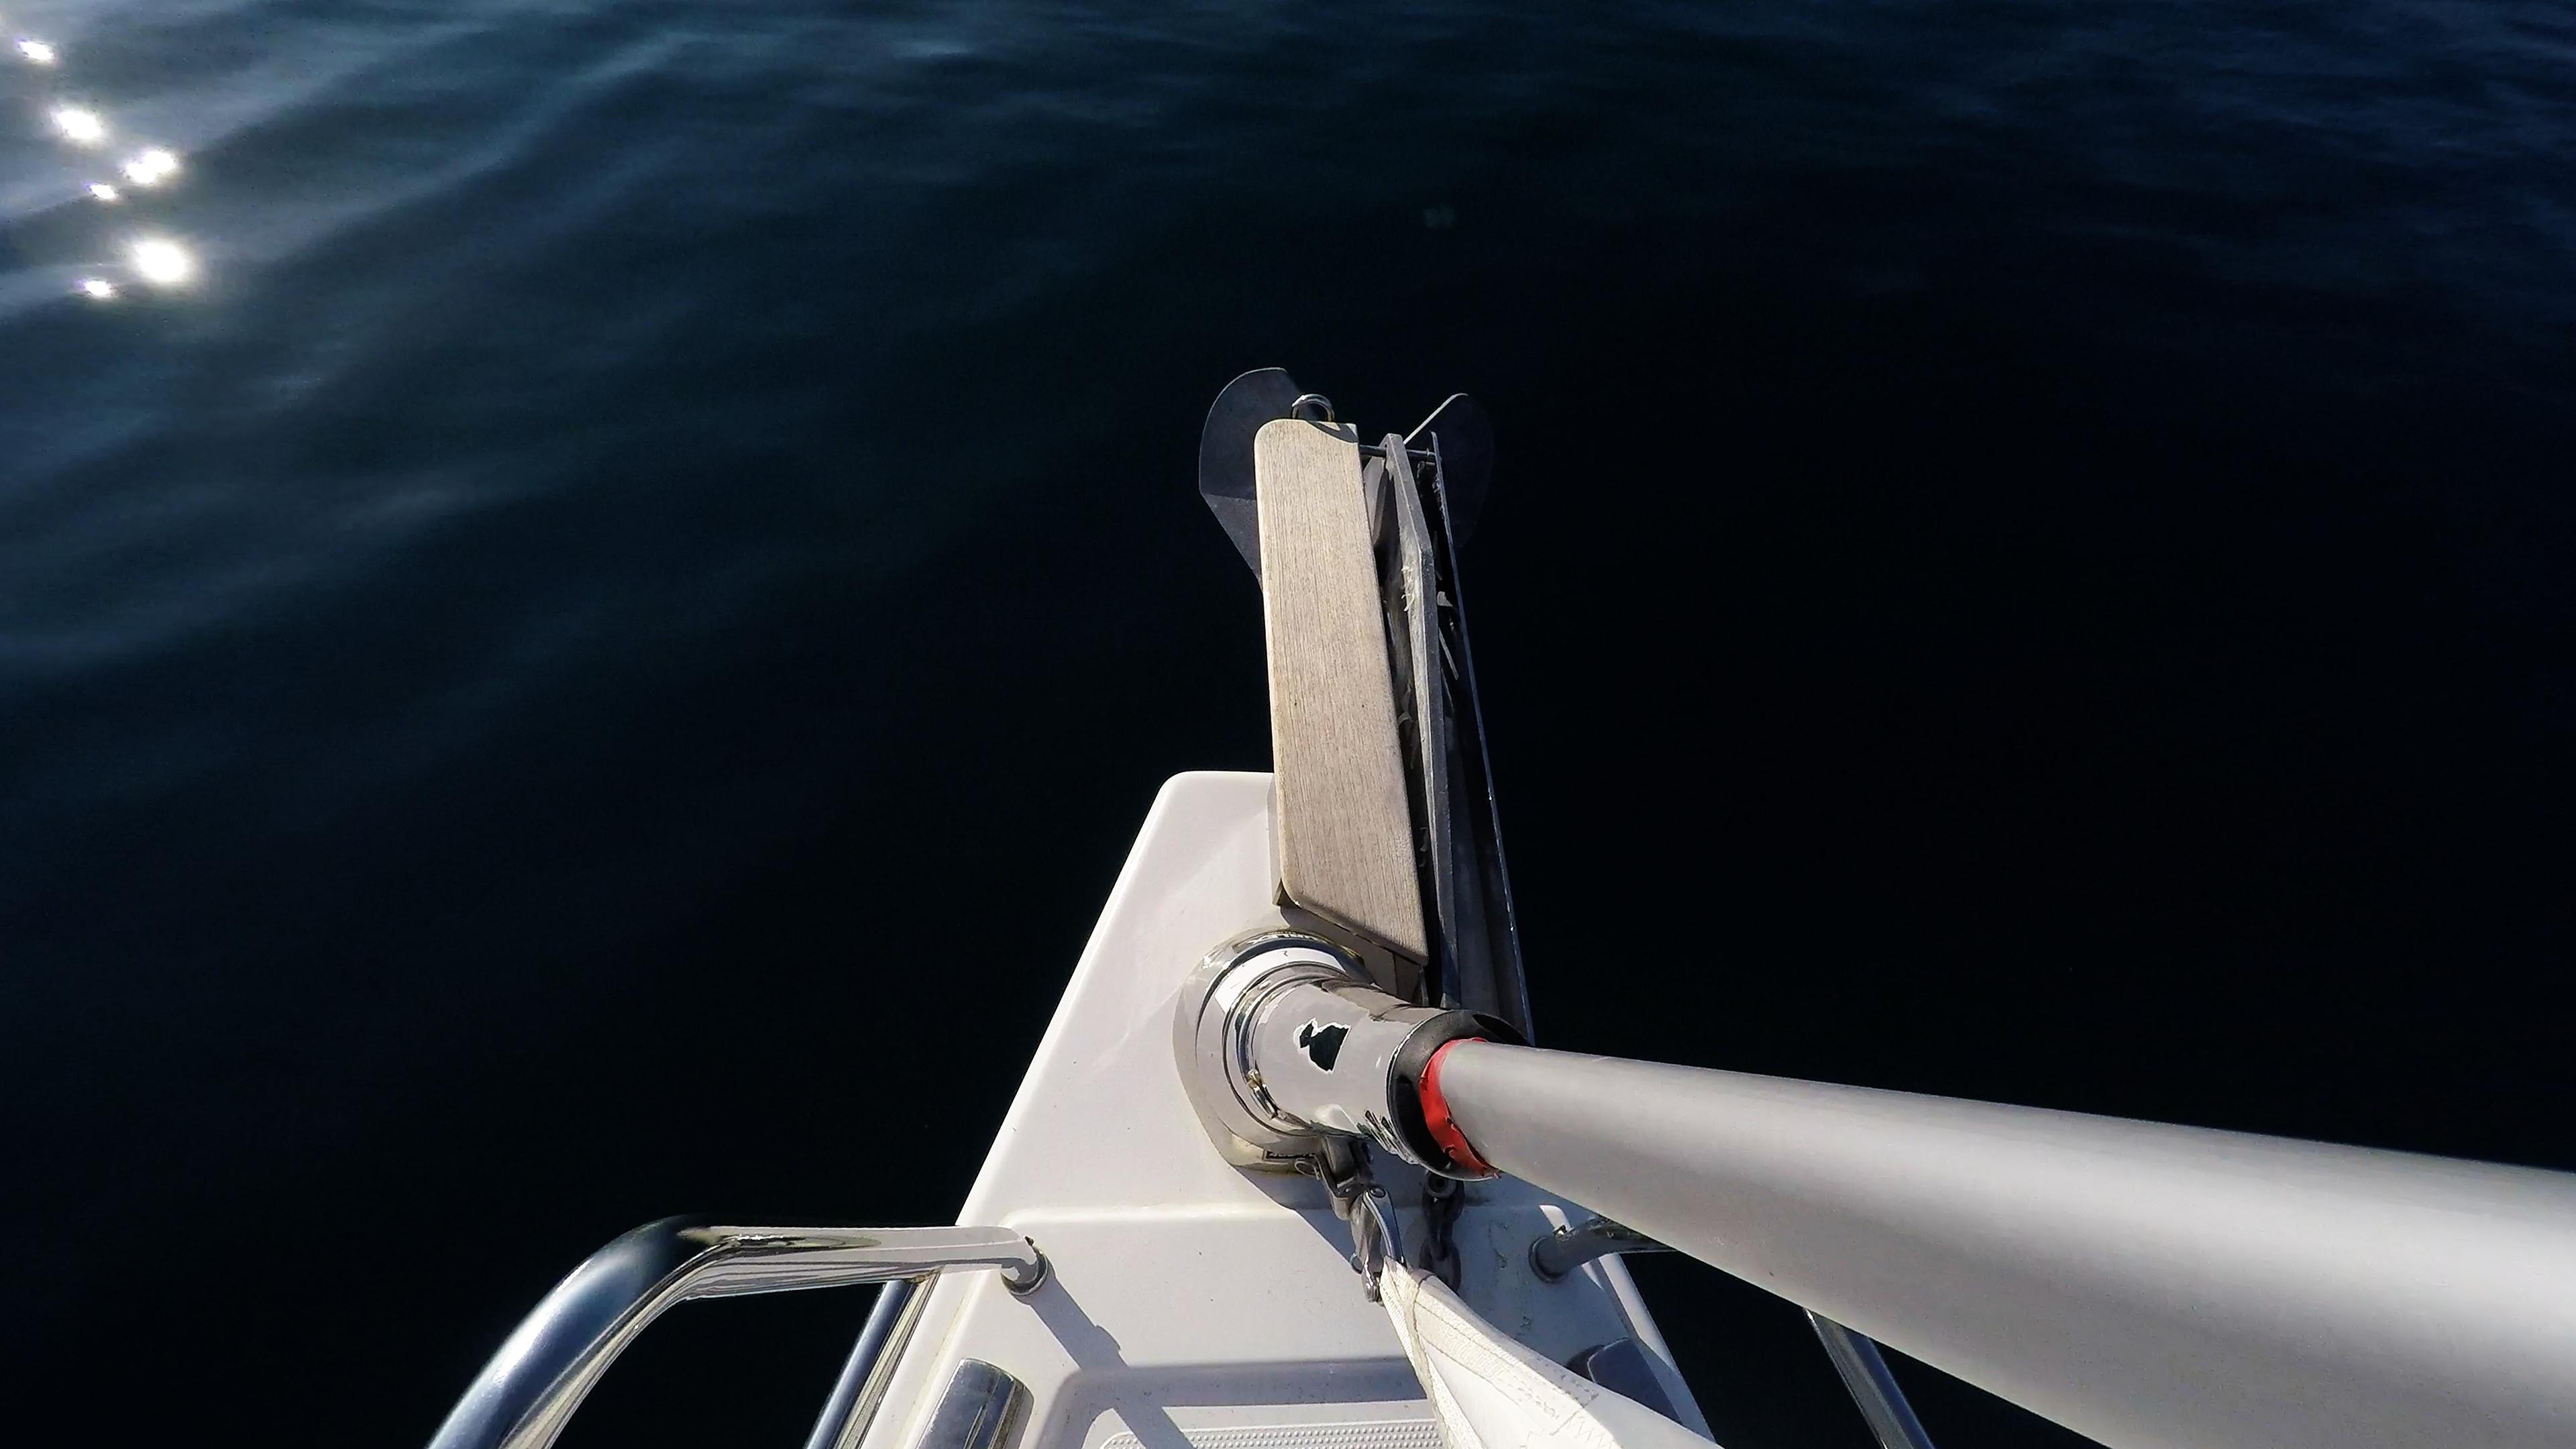 barcha a vela prua della barca a vela strallo rotolo genova veleggiare vele